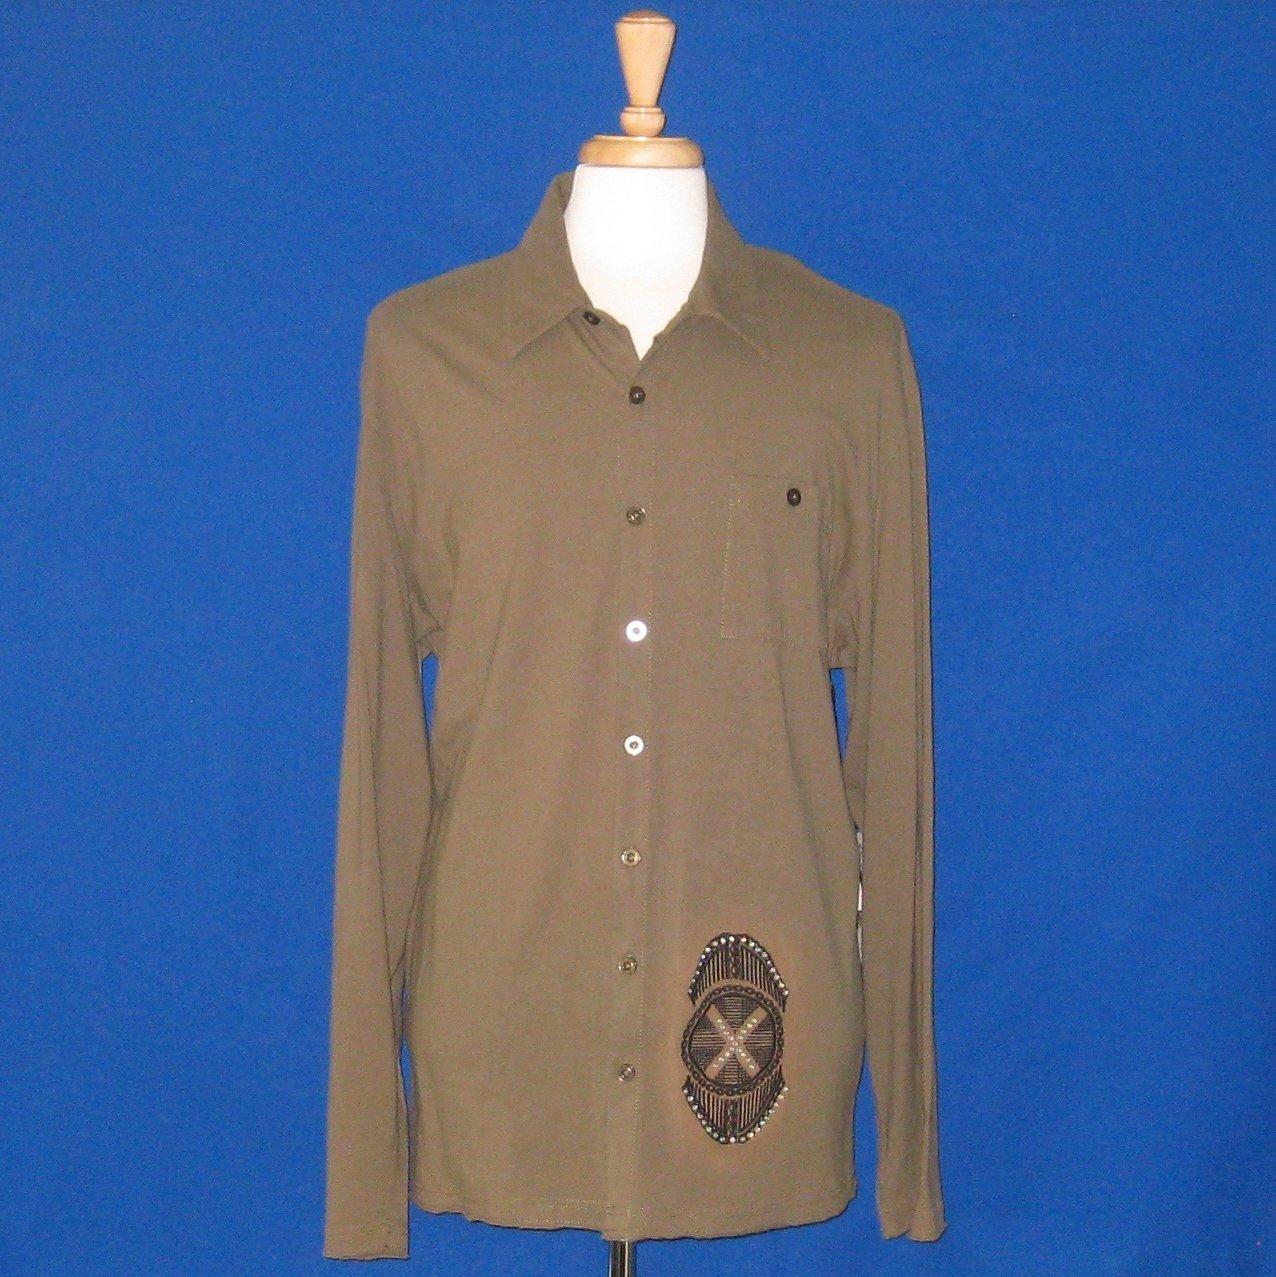 NWT X-Ray Jeans Rhinestone Studded Green Embroidered L/S Shirt - XXXL